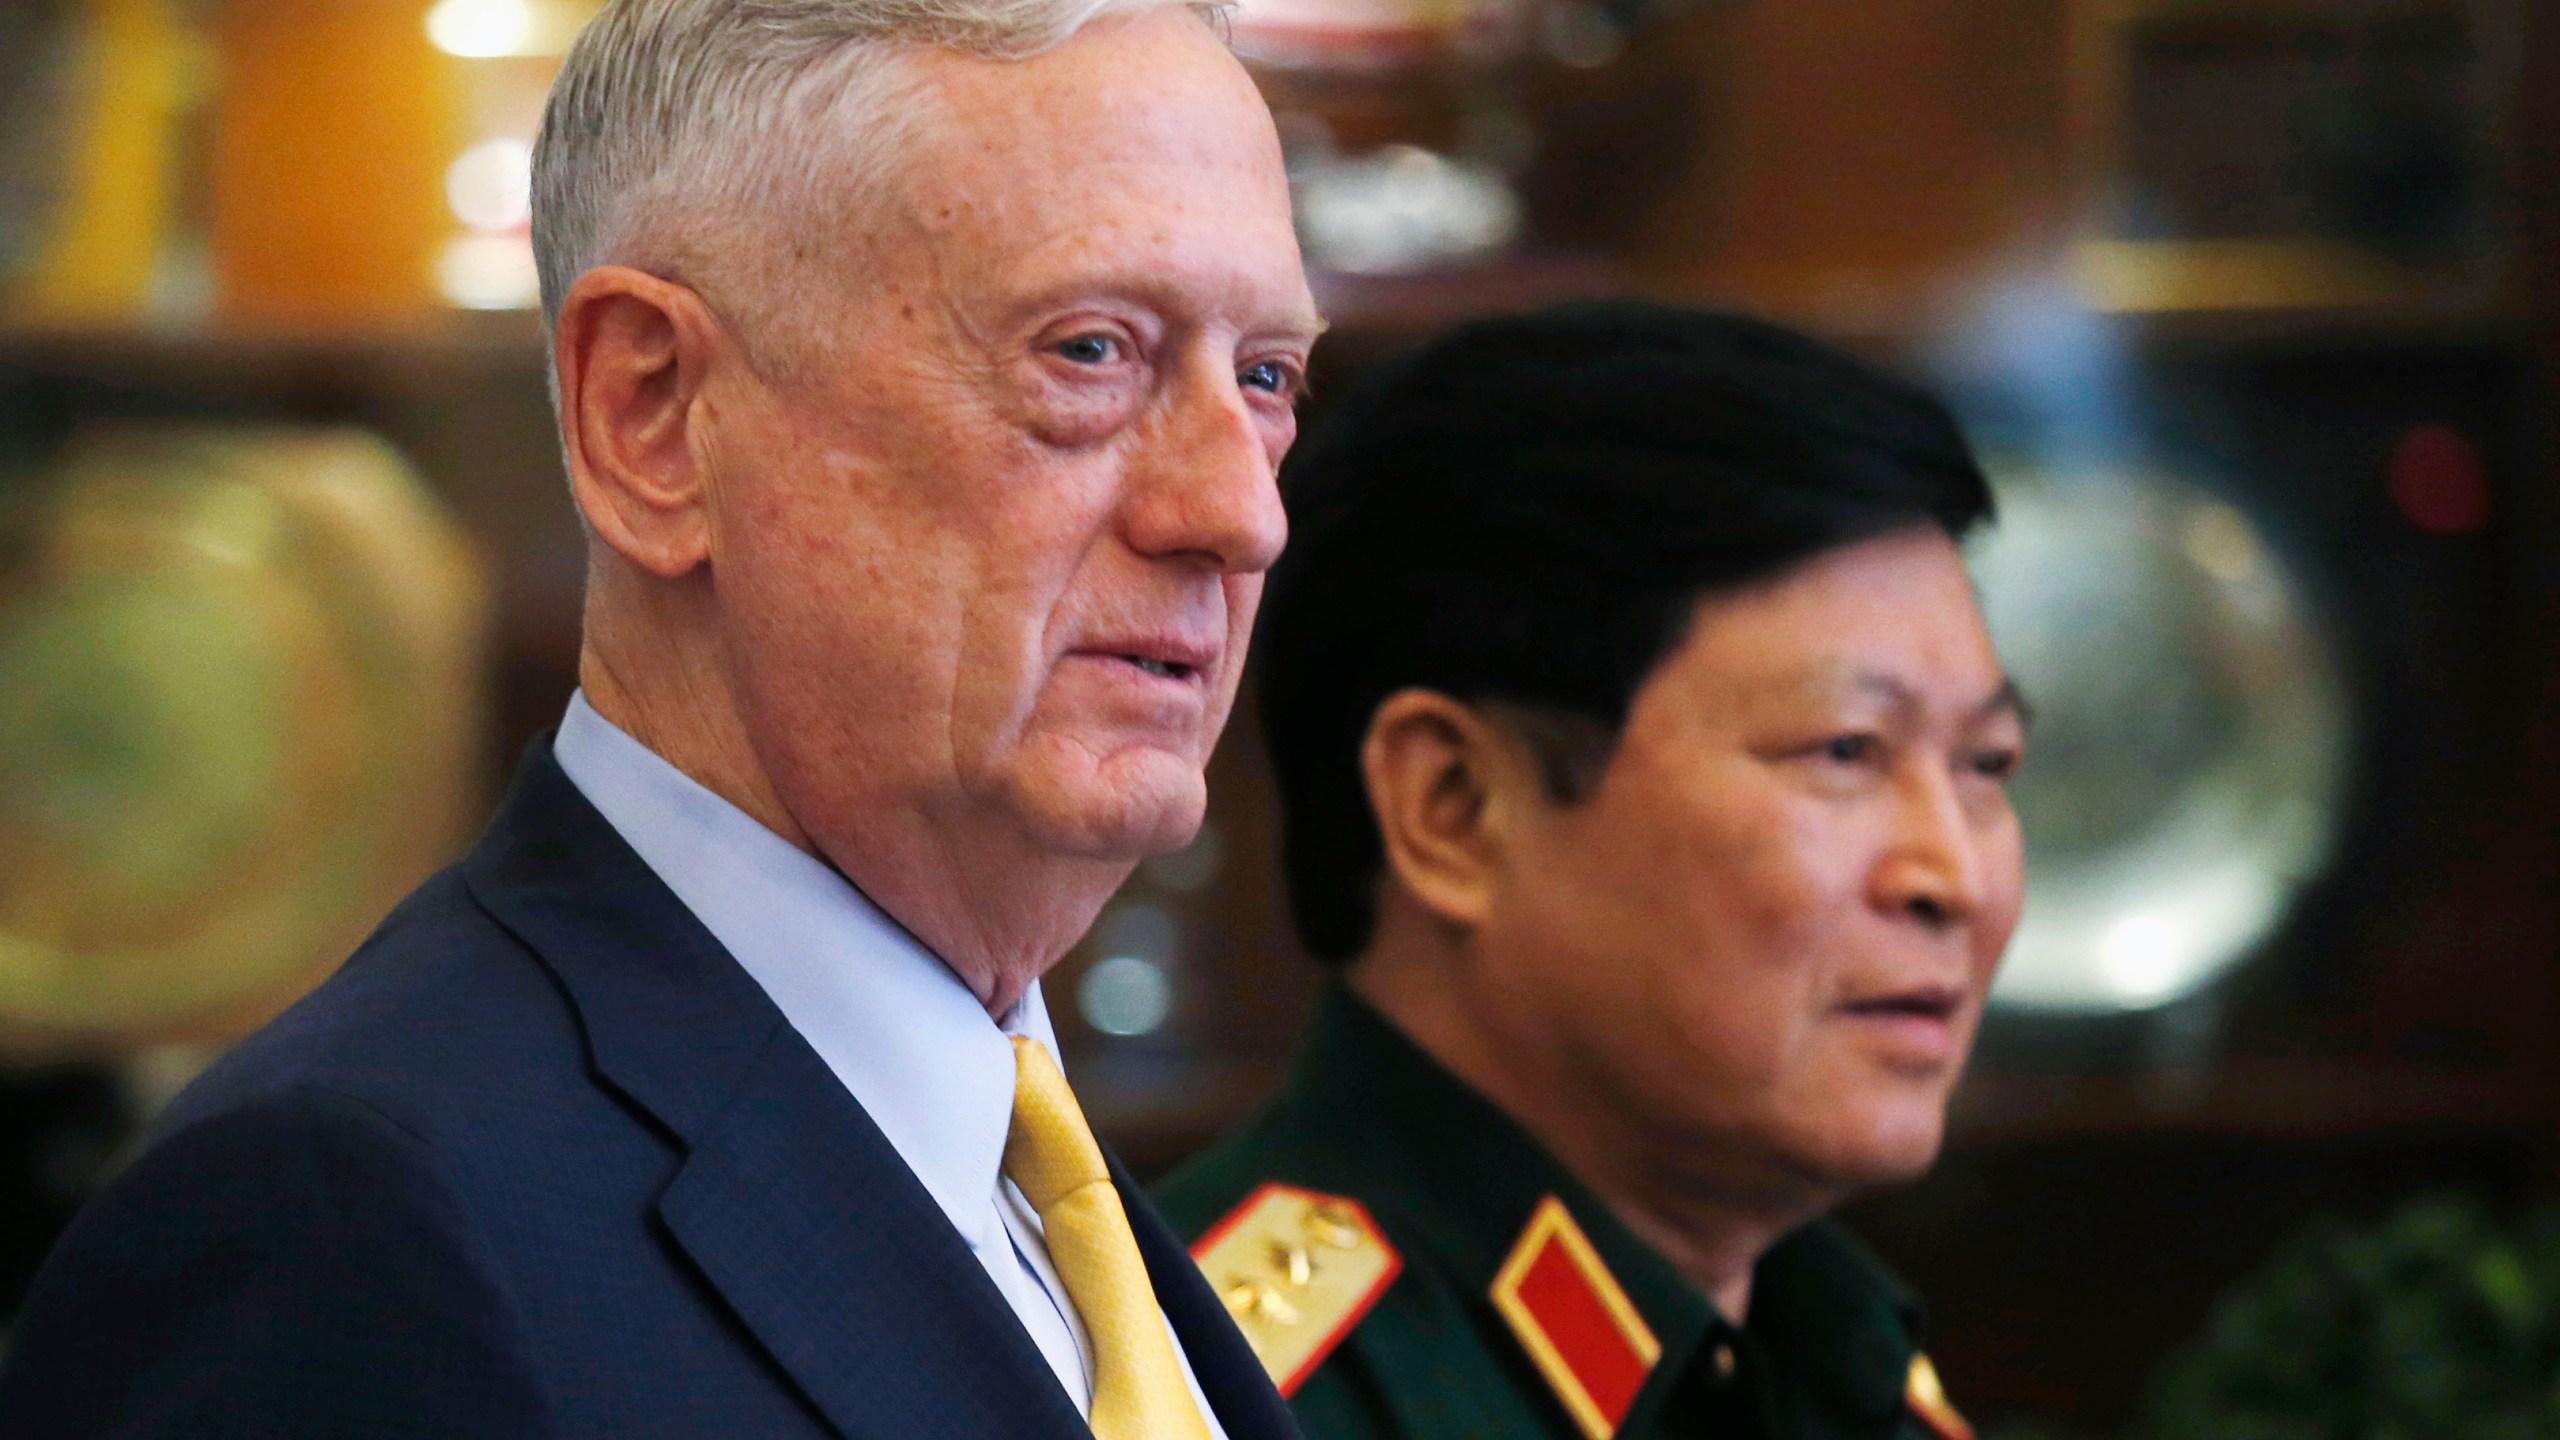 Vietnam_US_Mattis_51471-159532.jpg32475463